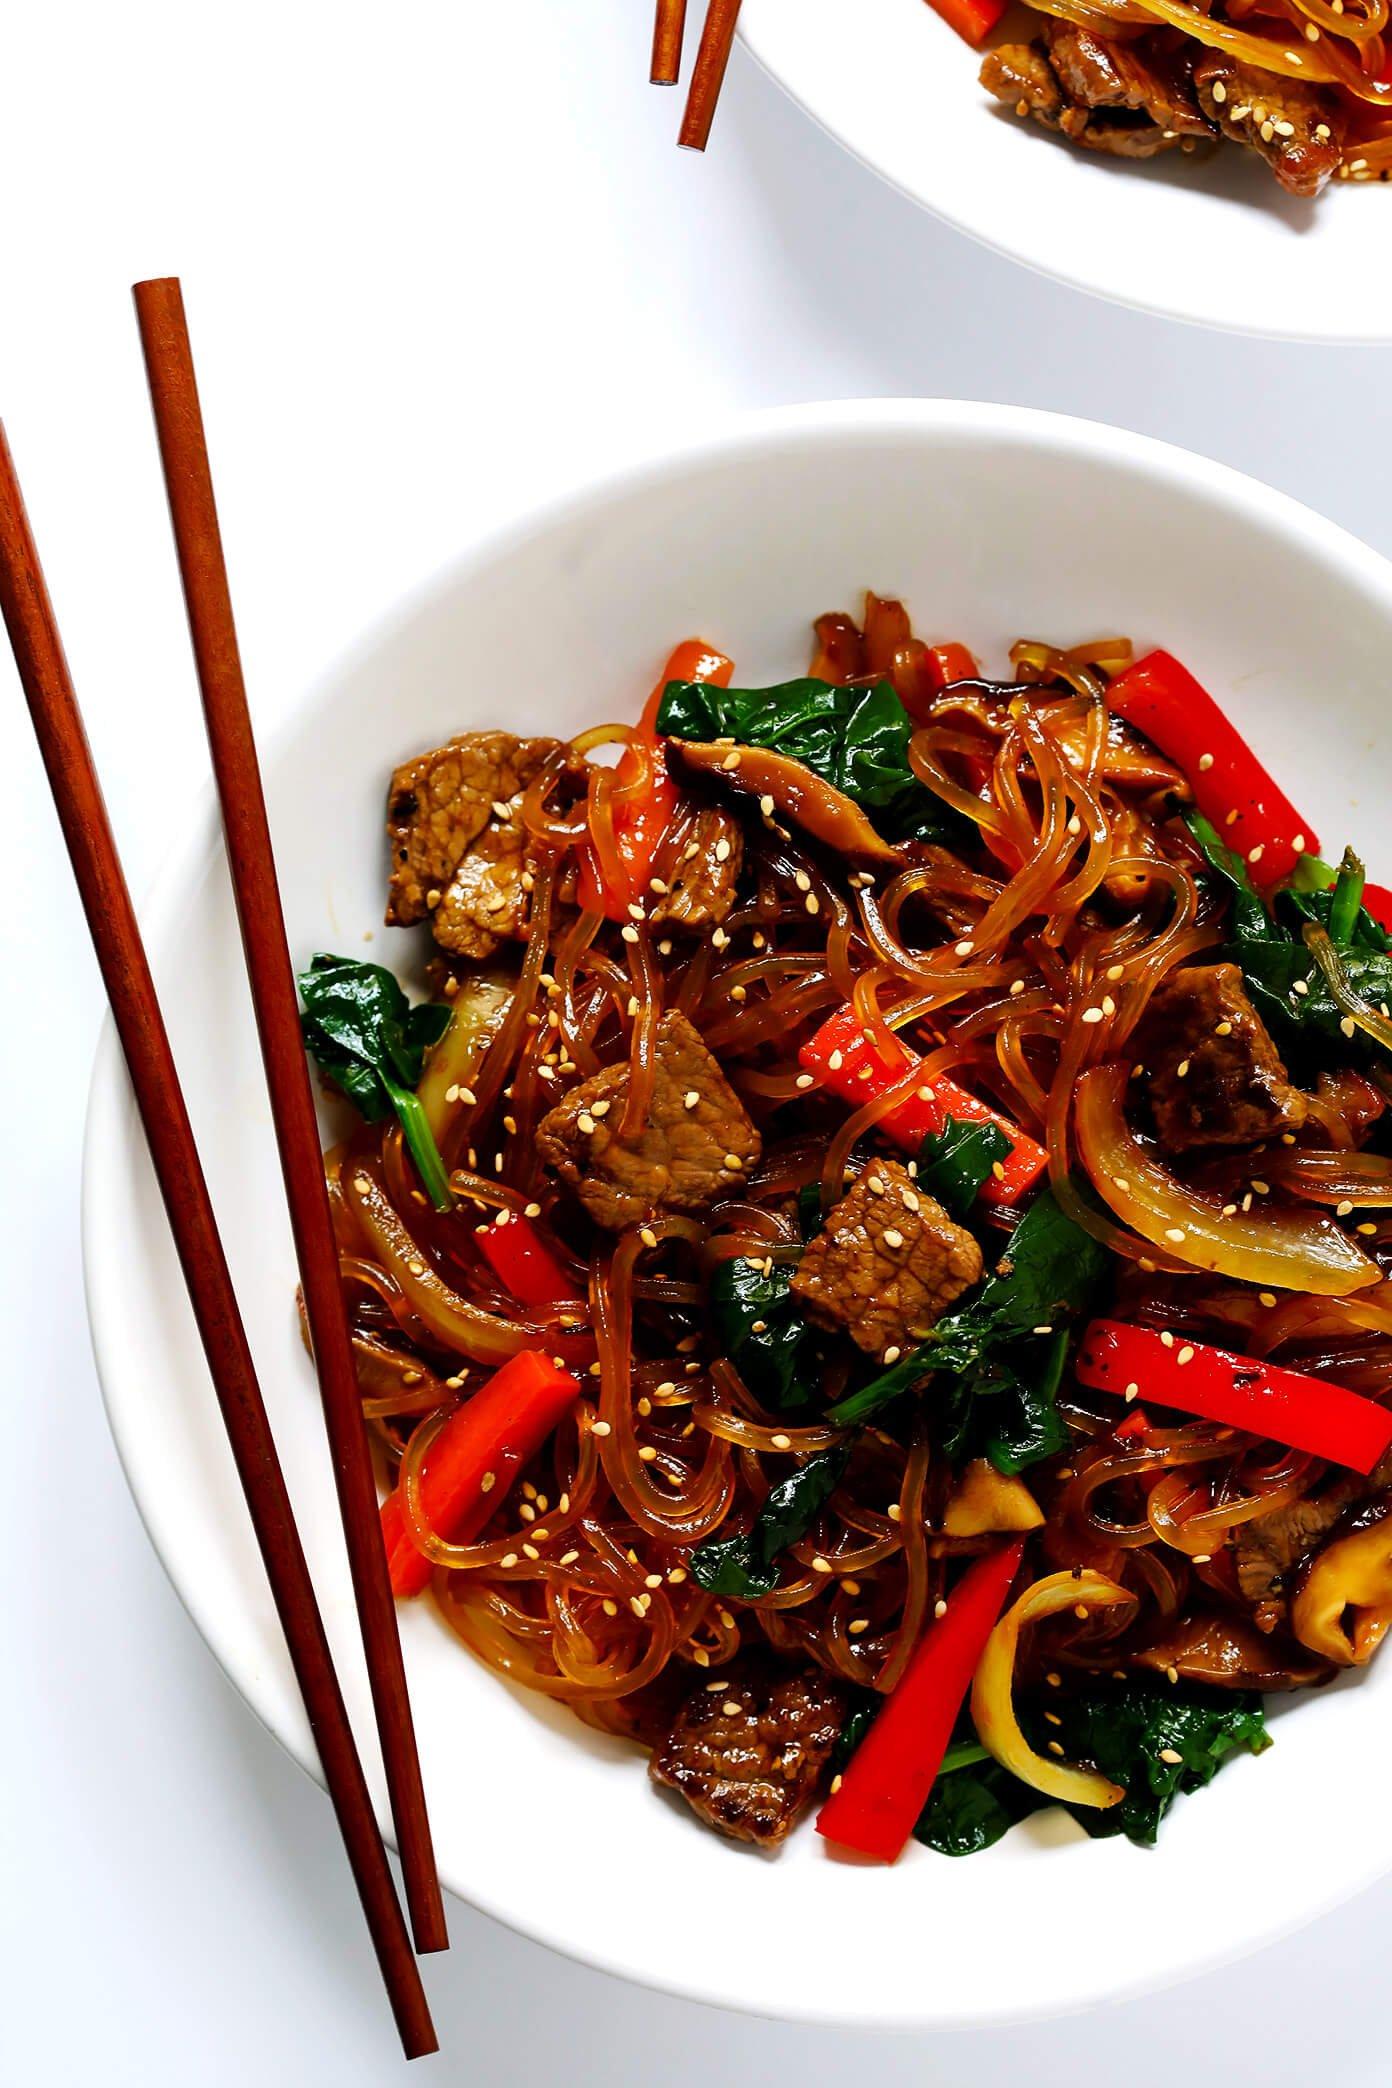 Japchae - Korean beef noodle stir-fry in bowl with chopsticks